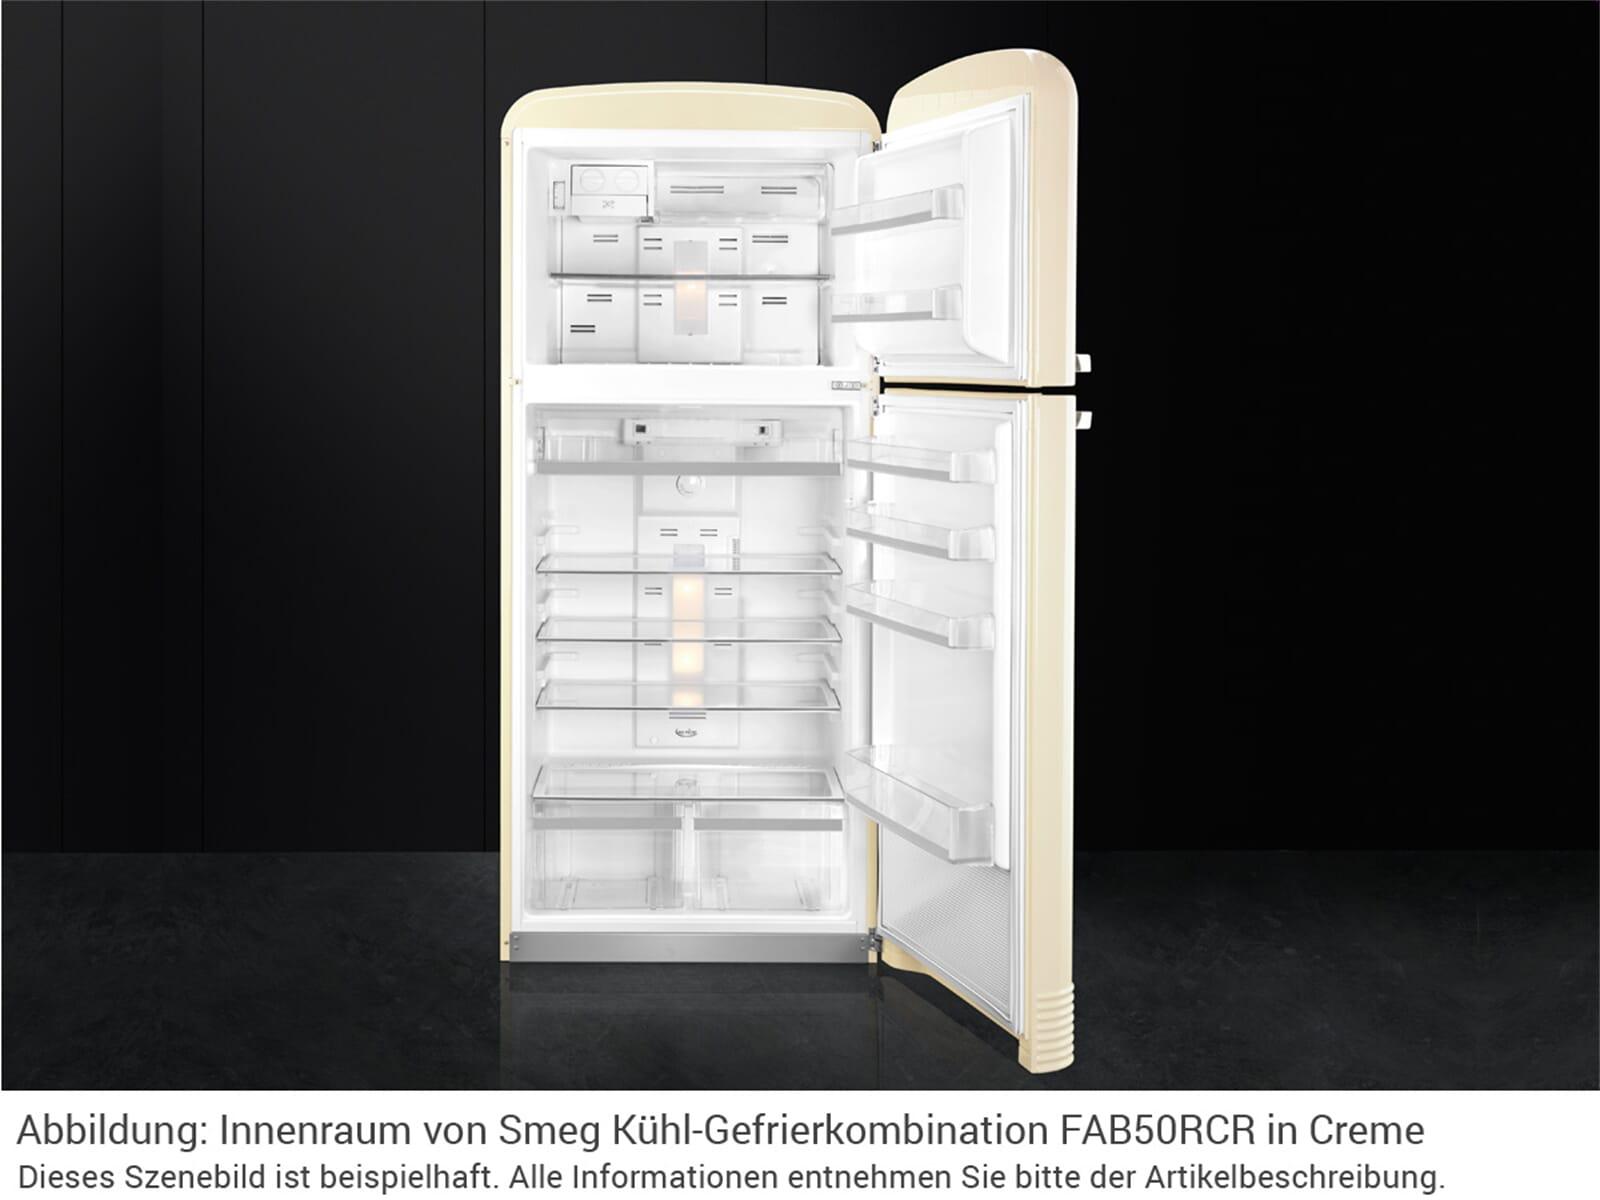 Smeg FAB50LCRB Kühl-Gefrierkombination Creme